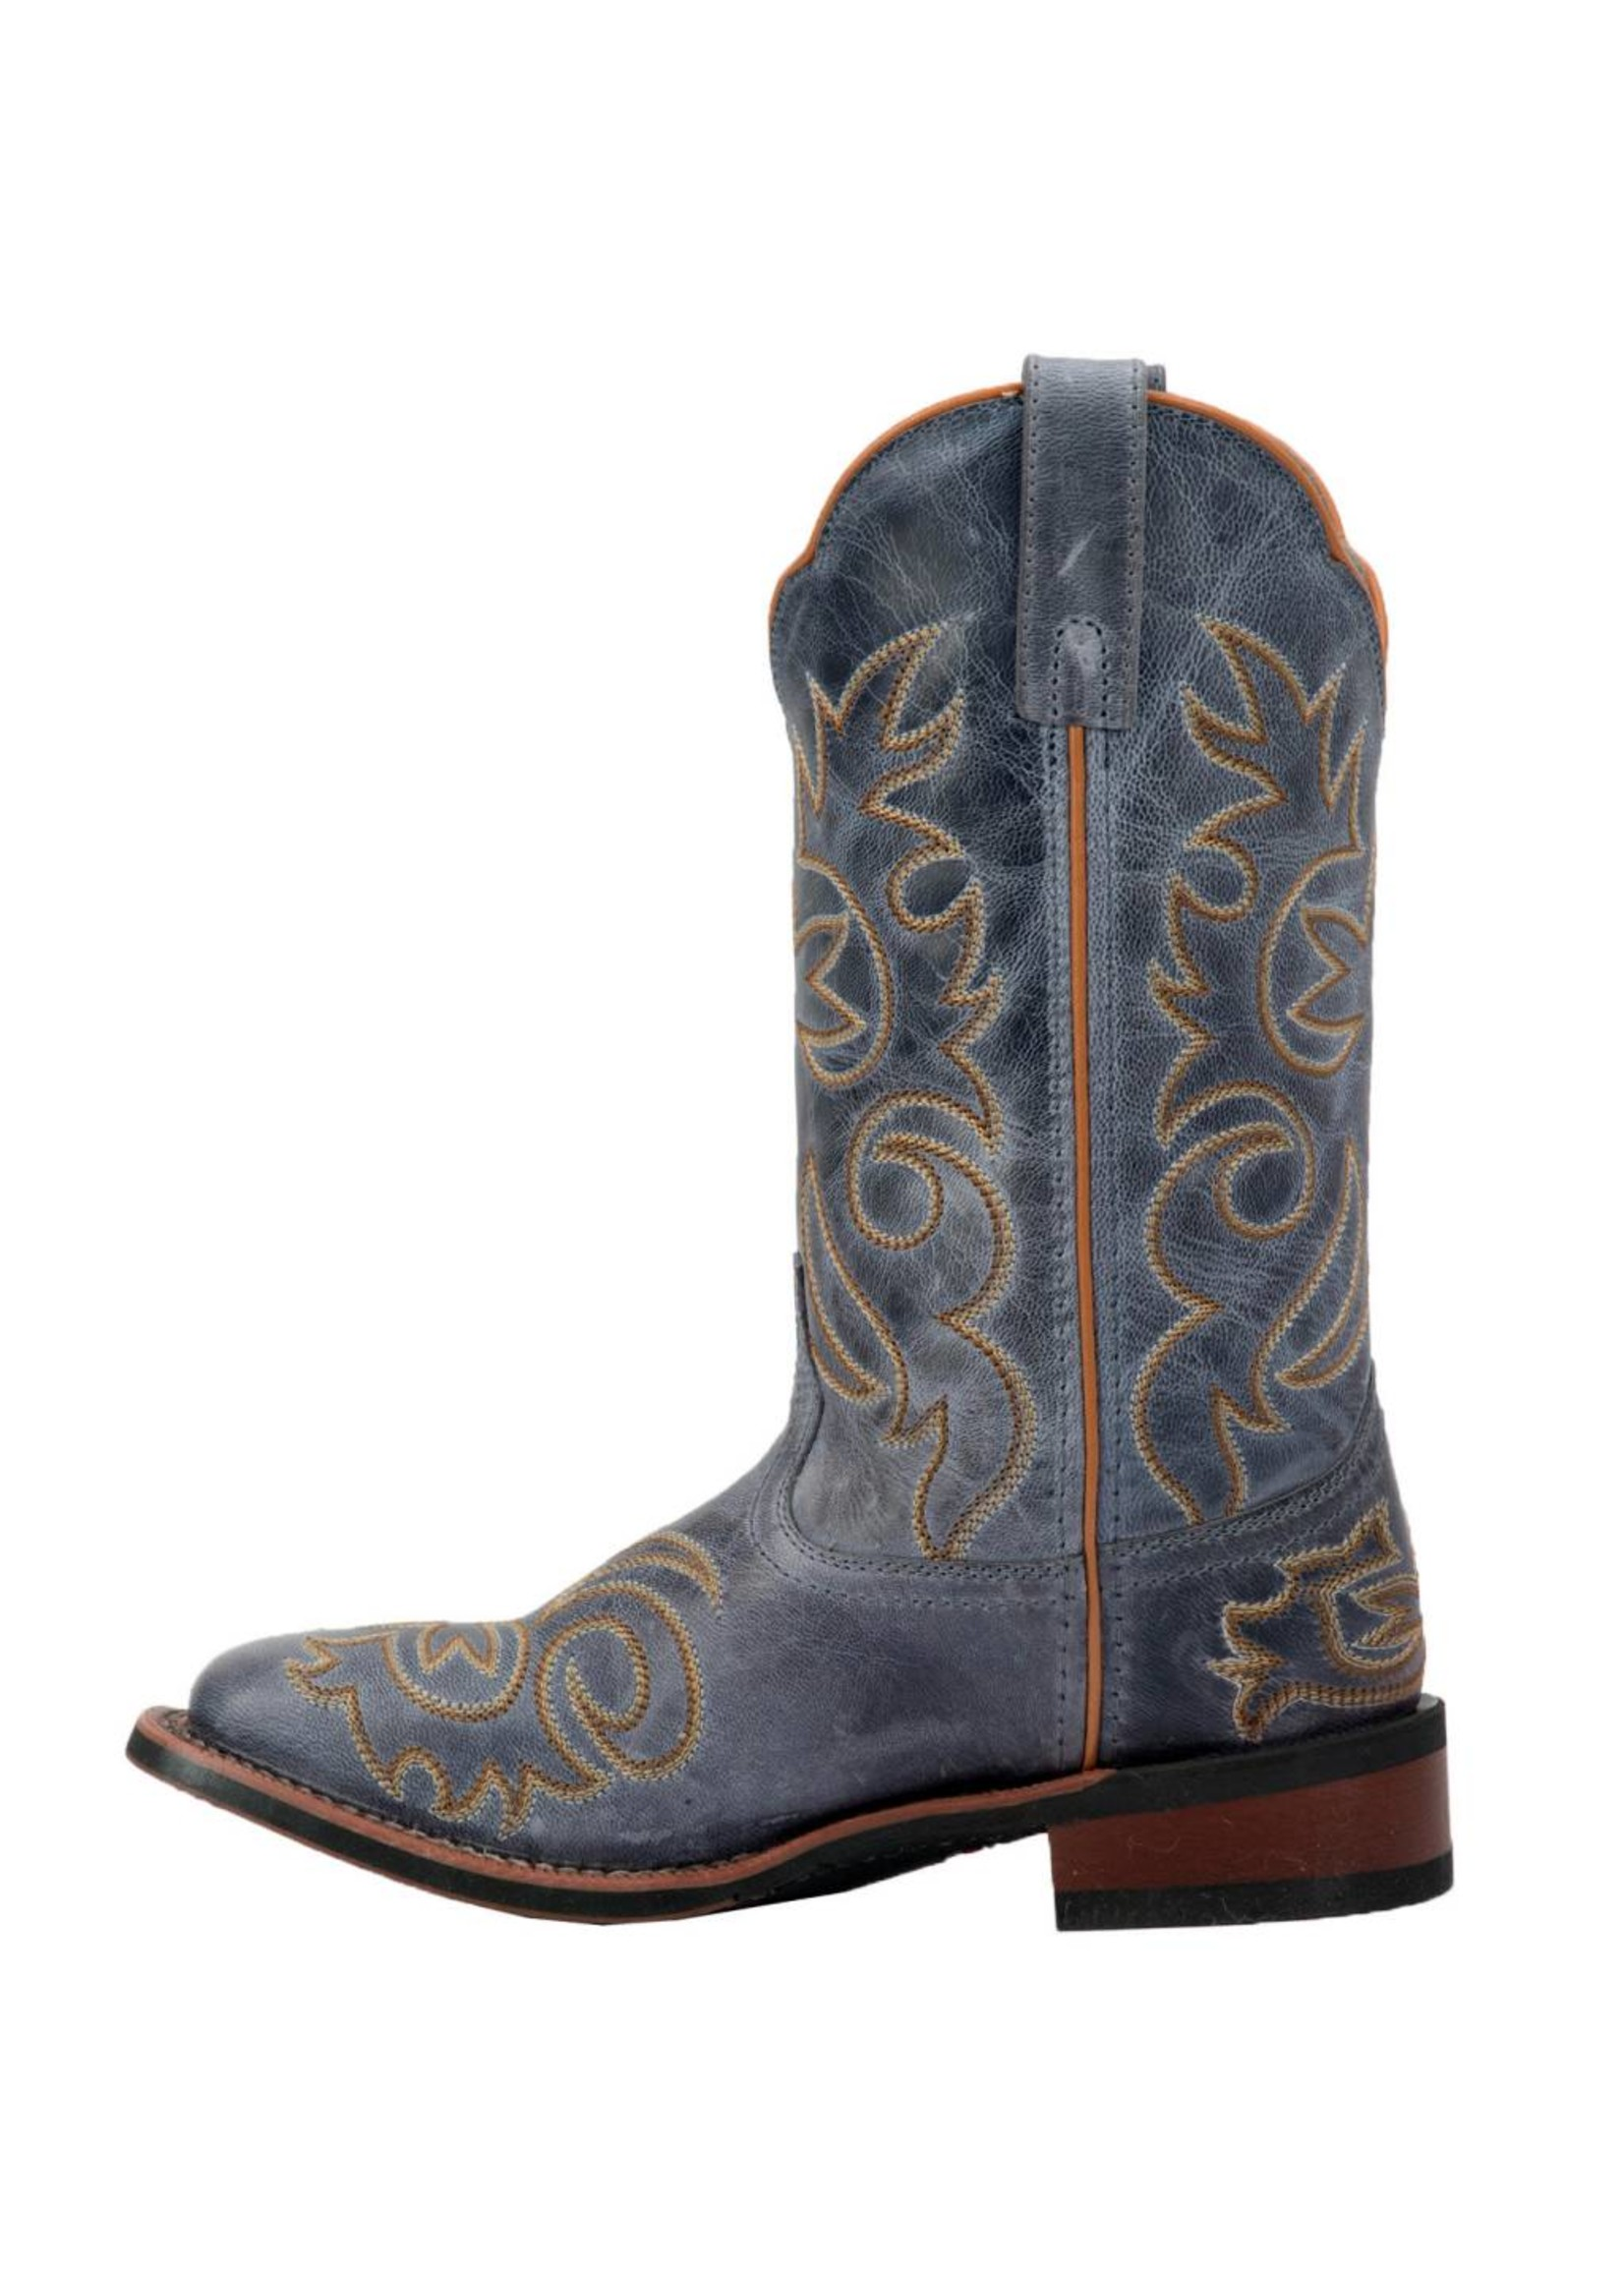 Laredo Ladies Ella Navy Embroidered Square Toe Western Boots 5676